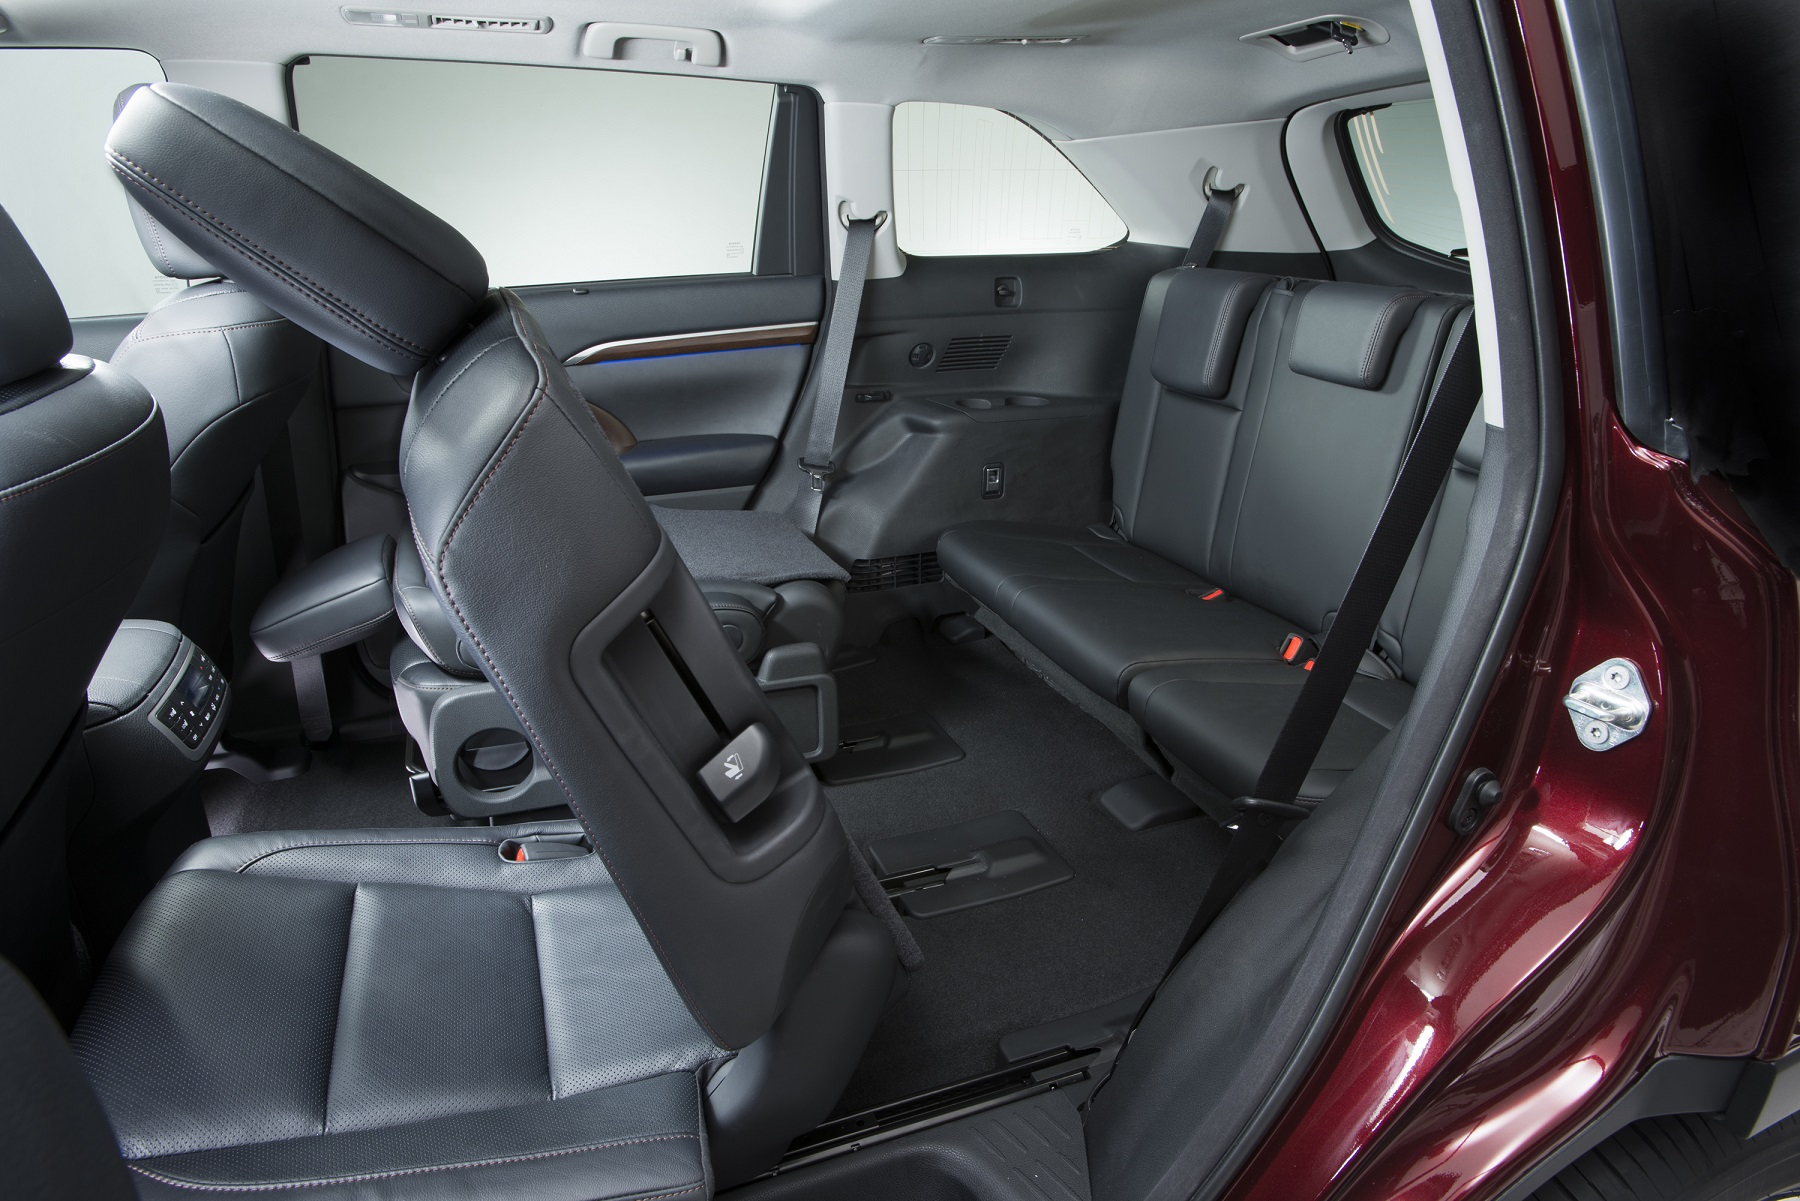 Popular Toyota Highlander becomes minivan alternative